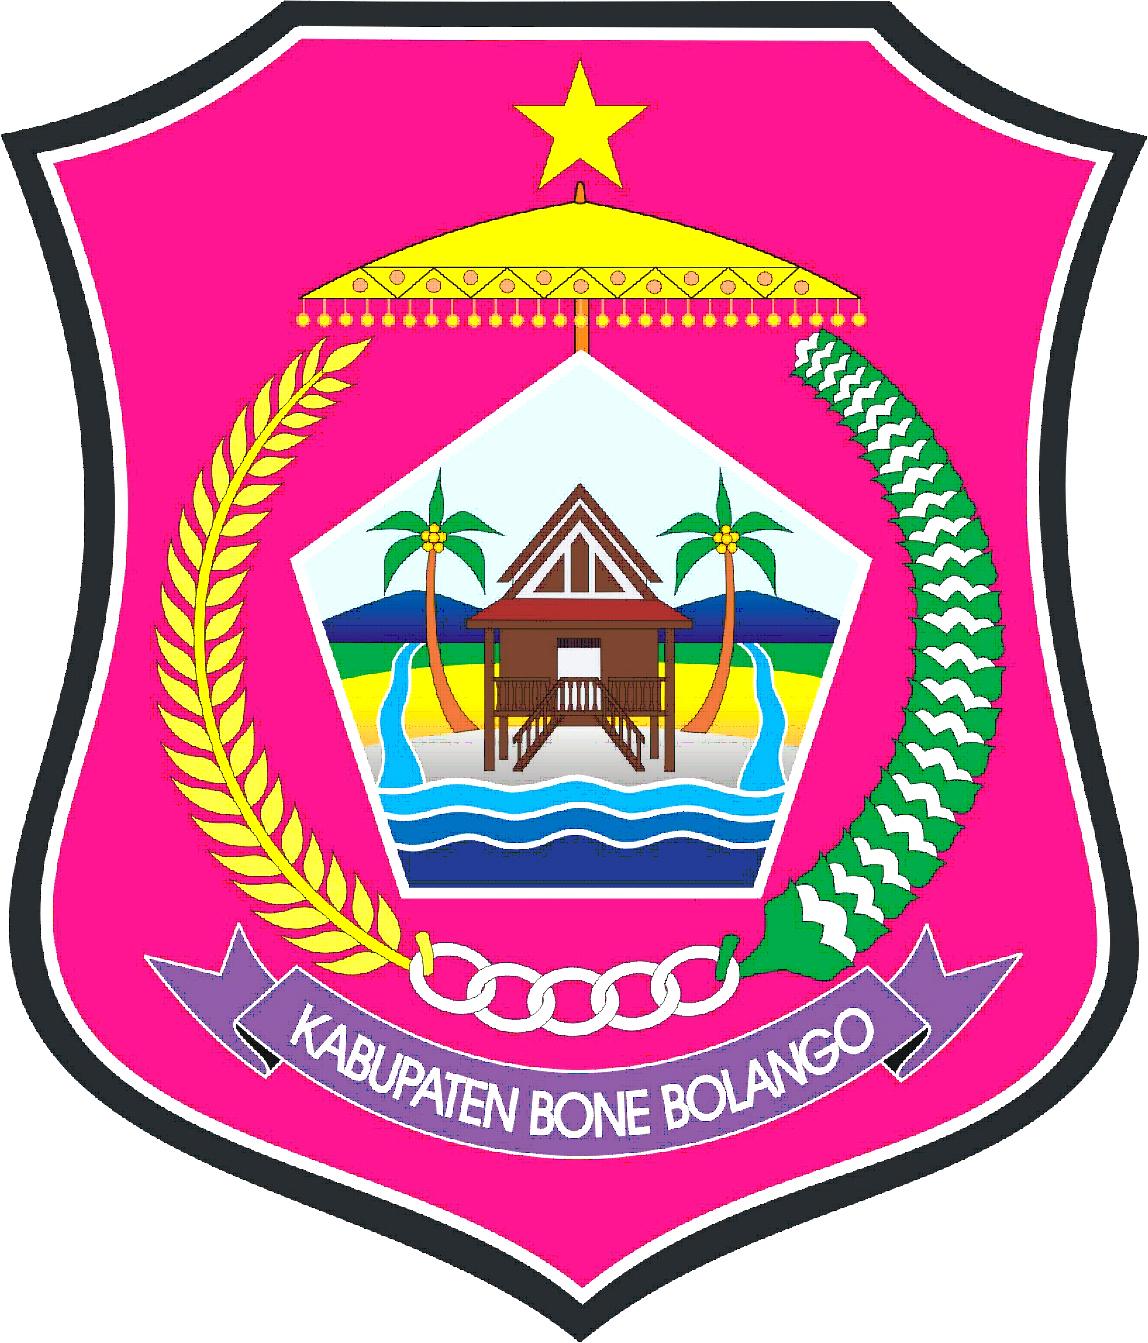 Kabupaten Bone Bolango - Wikipedia bahasa Indonesia ...